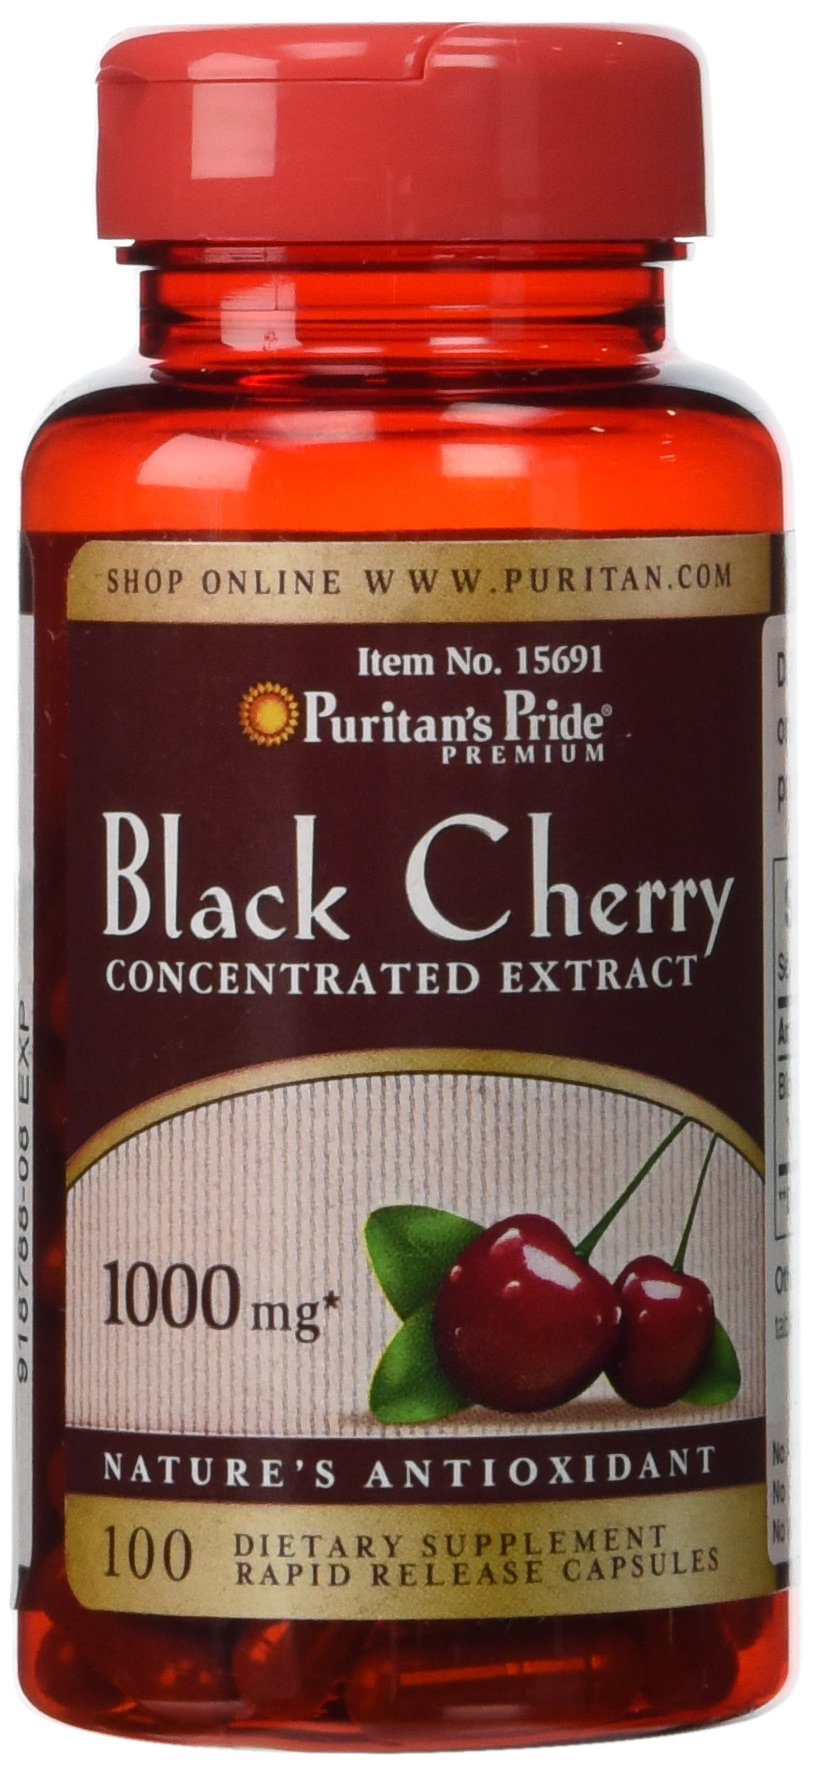 Puritan's Pride Black Cherry 1000 mg-100 Capsules